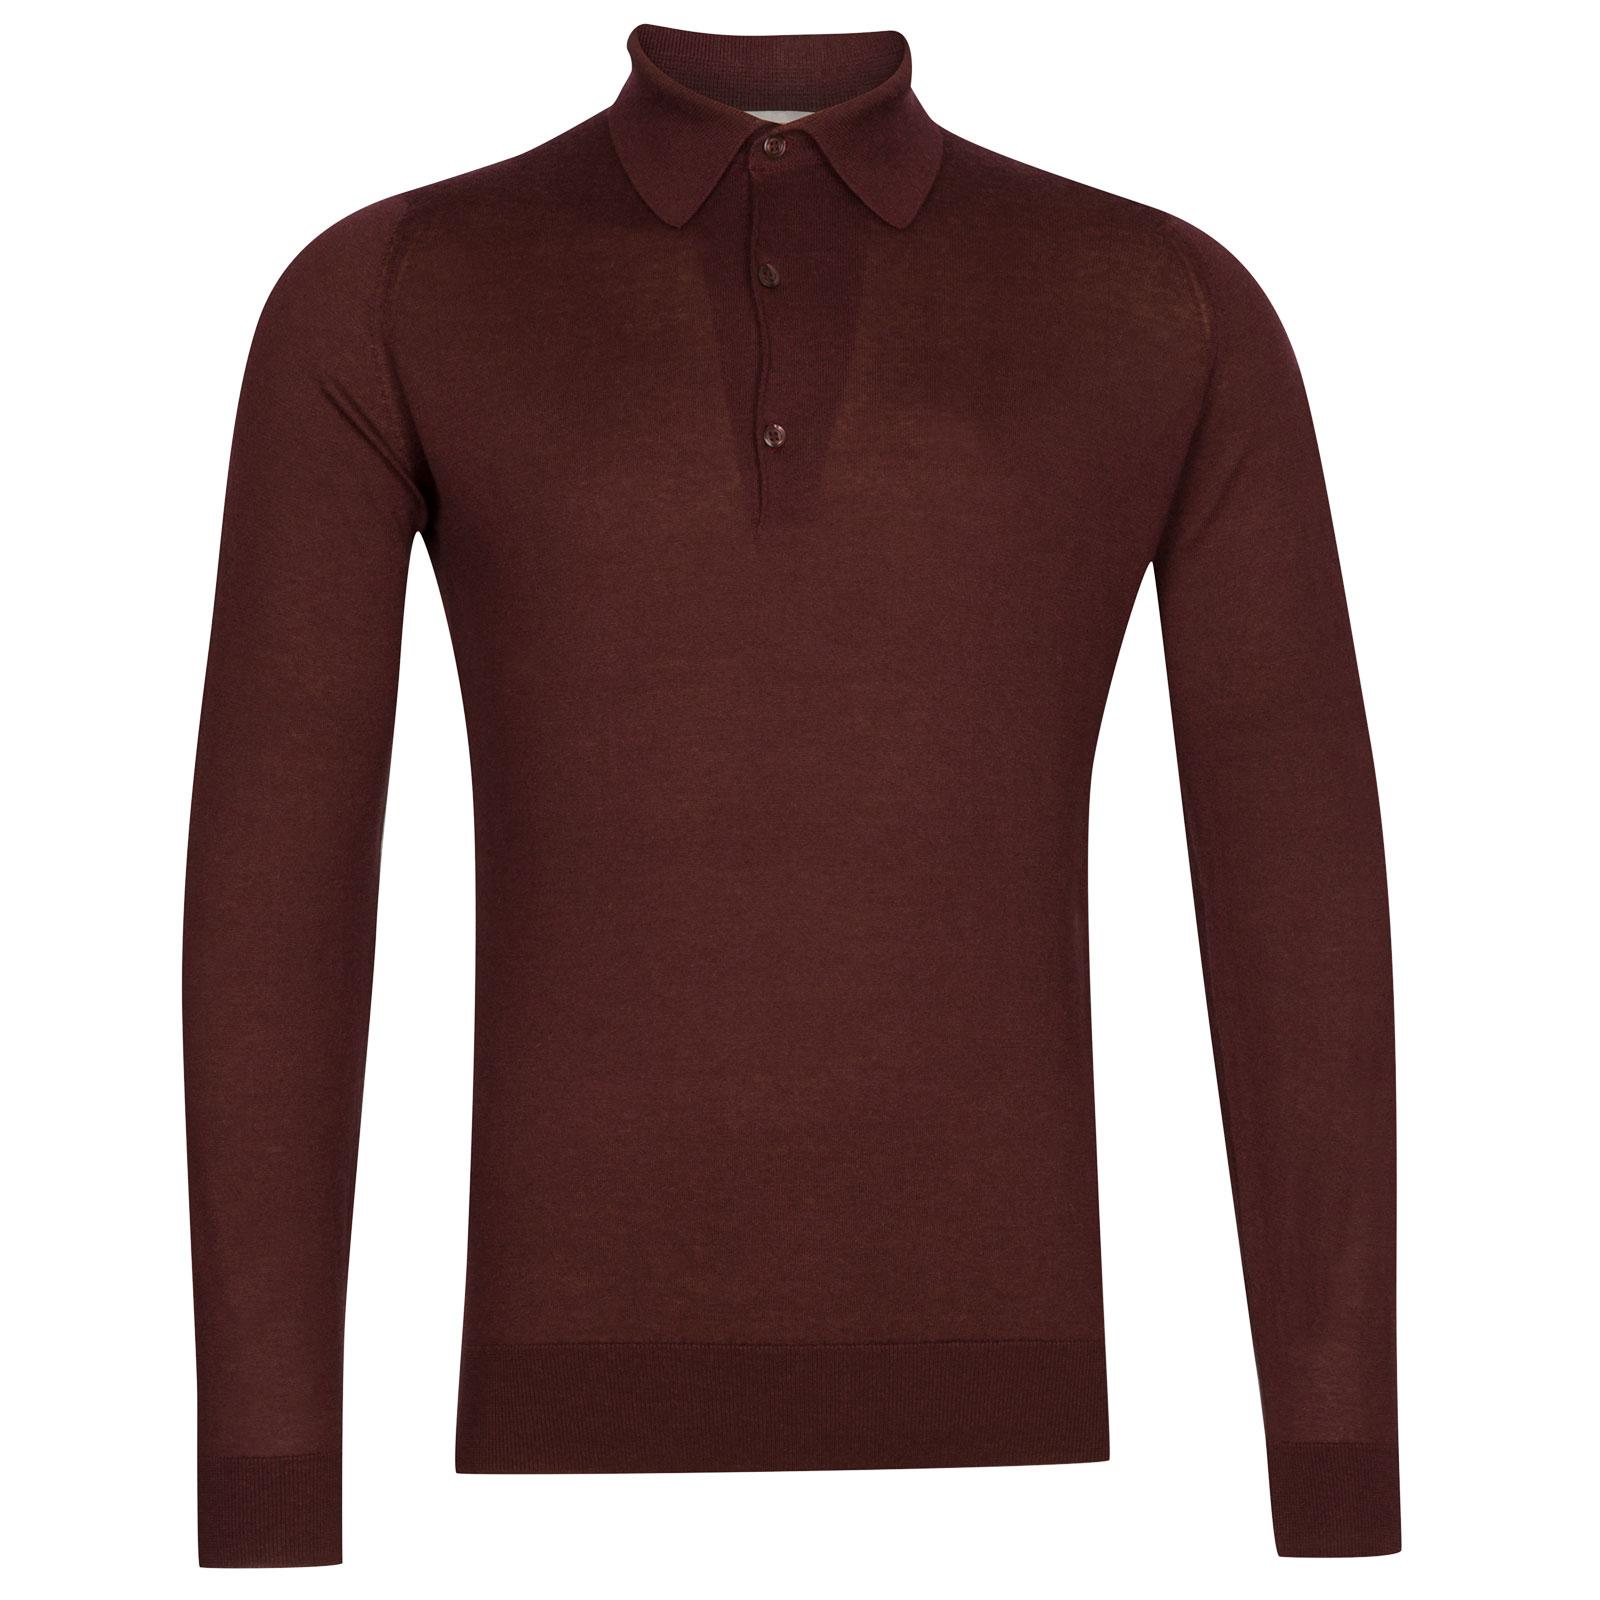 John Smedley Lanlay Sea Island Cotton and Cashmere Shirt in Burgundy